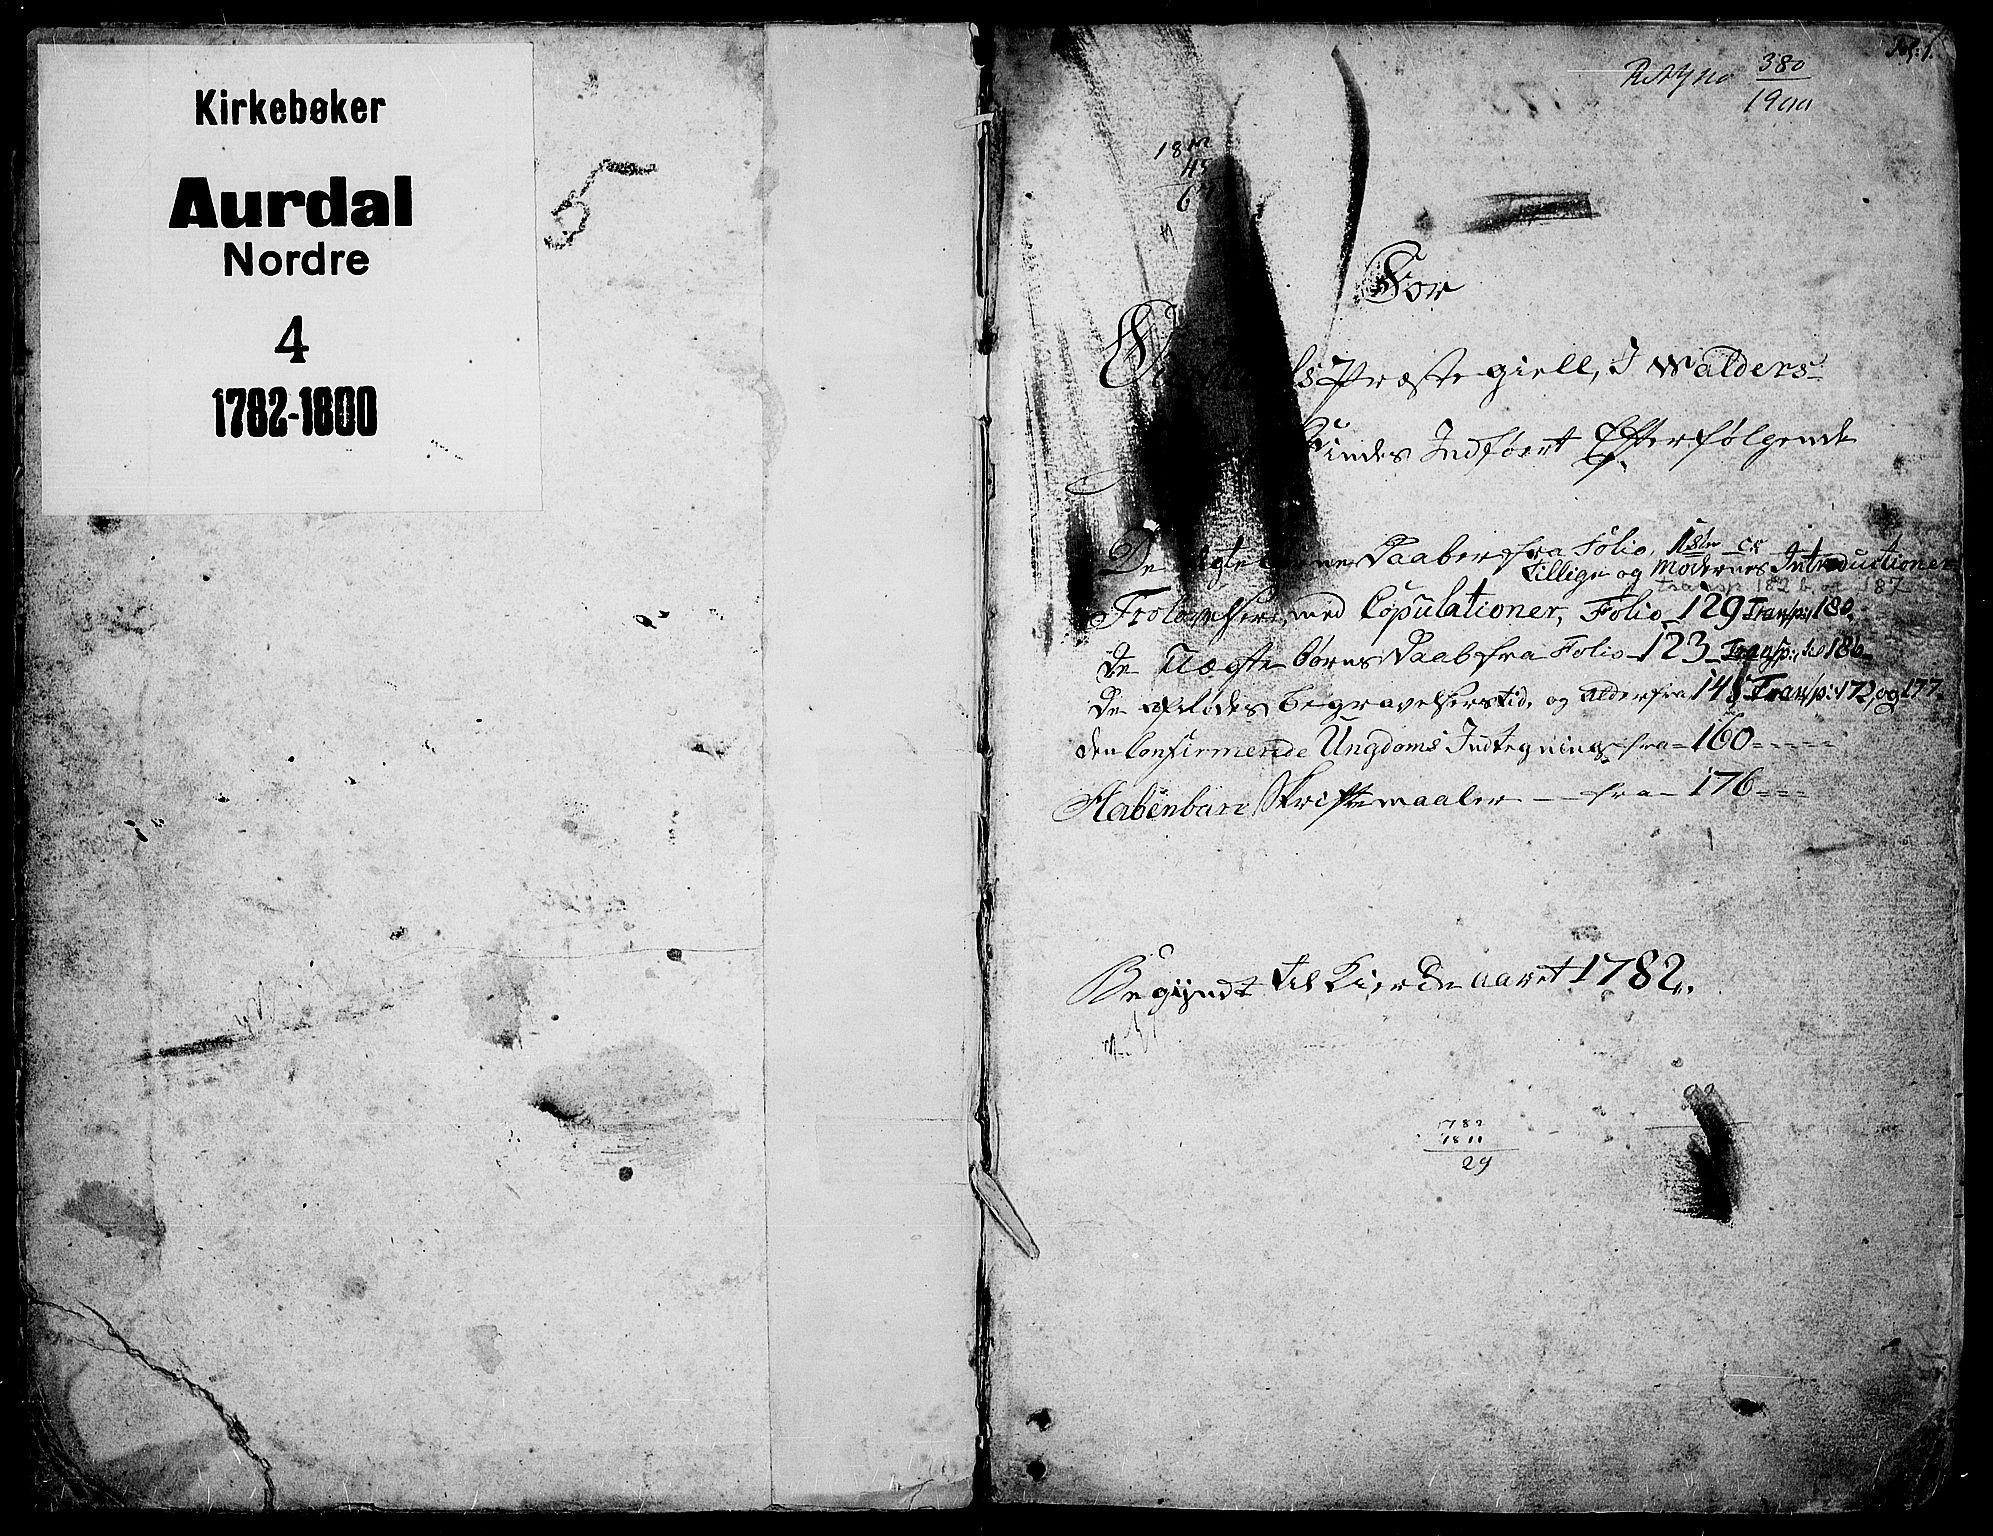 SAH, Aurdal prestekontor, Ministerialbok nr. 6, 1781-1804, s. 1